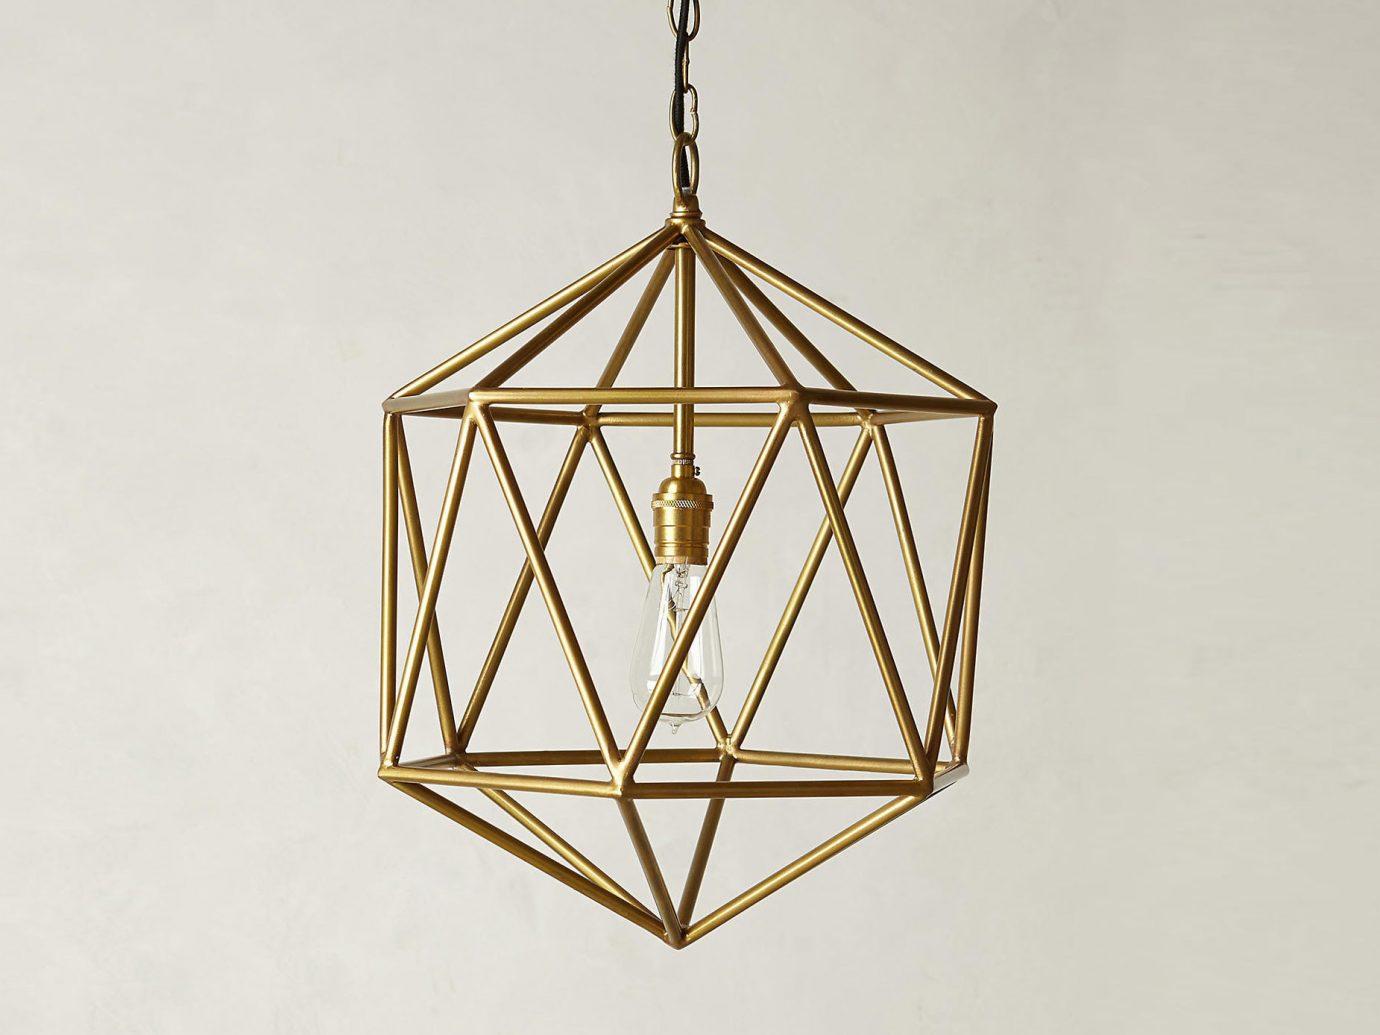 Style + Design Travel Shop light fixture lighting ceiling fixture product design metal